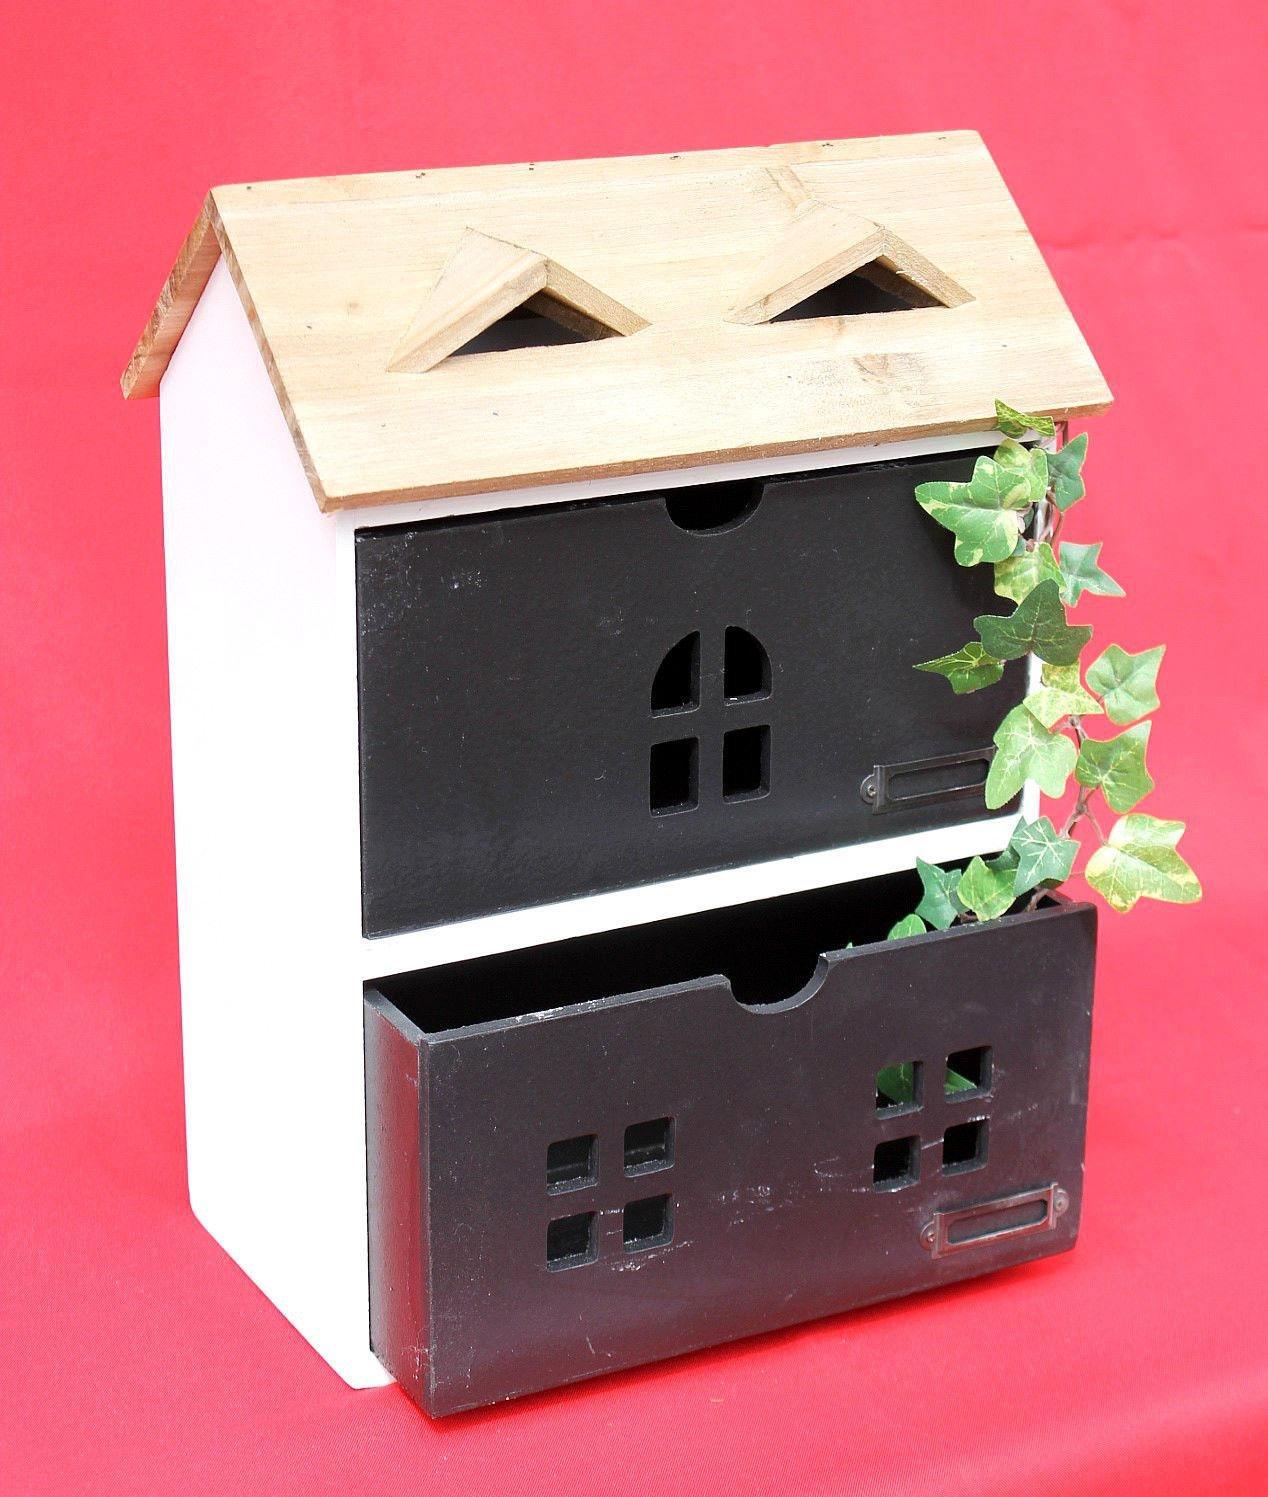 DanDiBo Mini dresser House Dresser 14B410 Chest of drawers with 2 drawers 38 cm Organizer Kitchen shelf